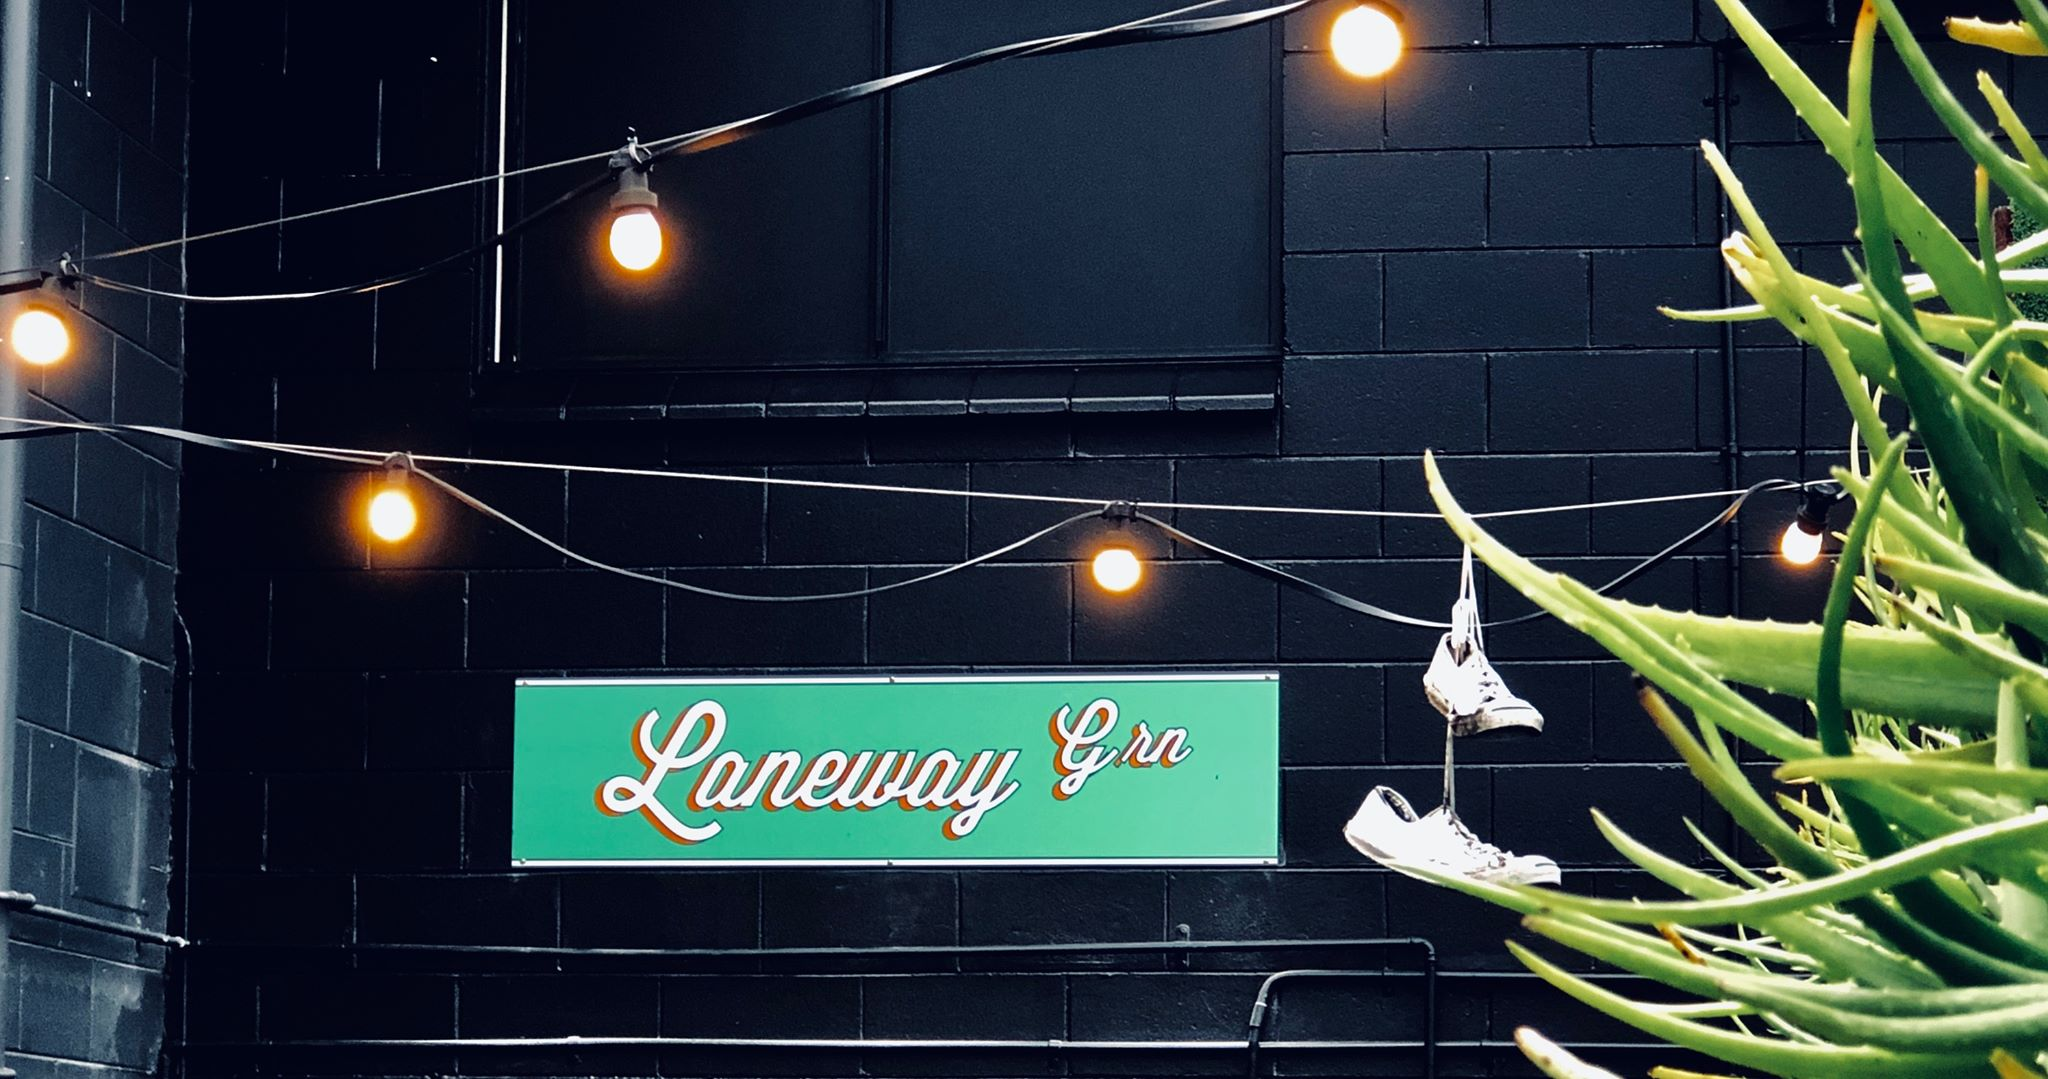 Laneway Green.jpg